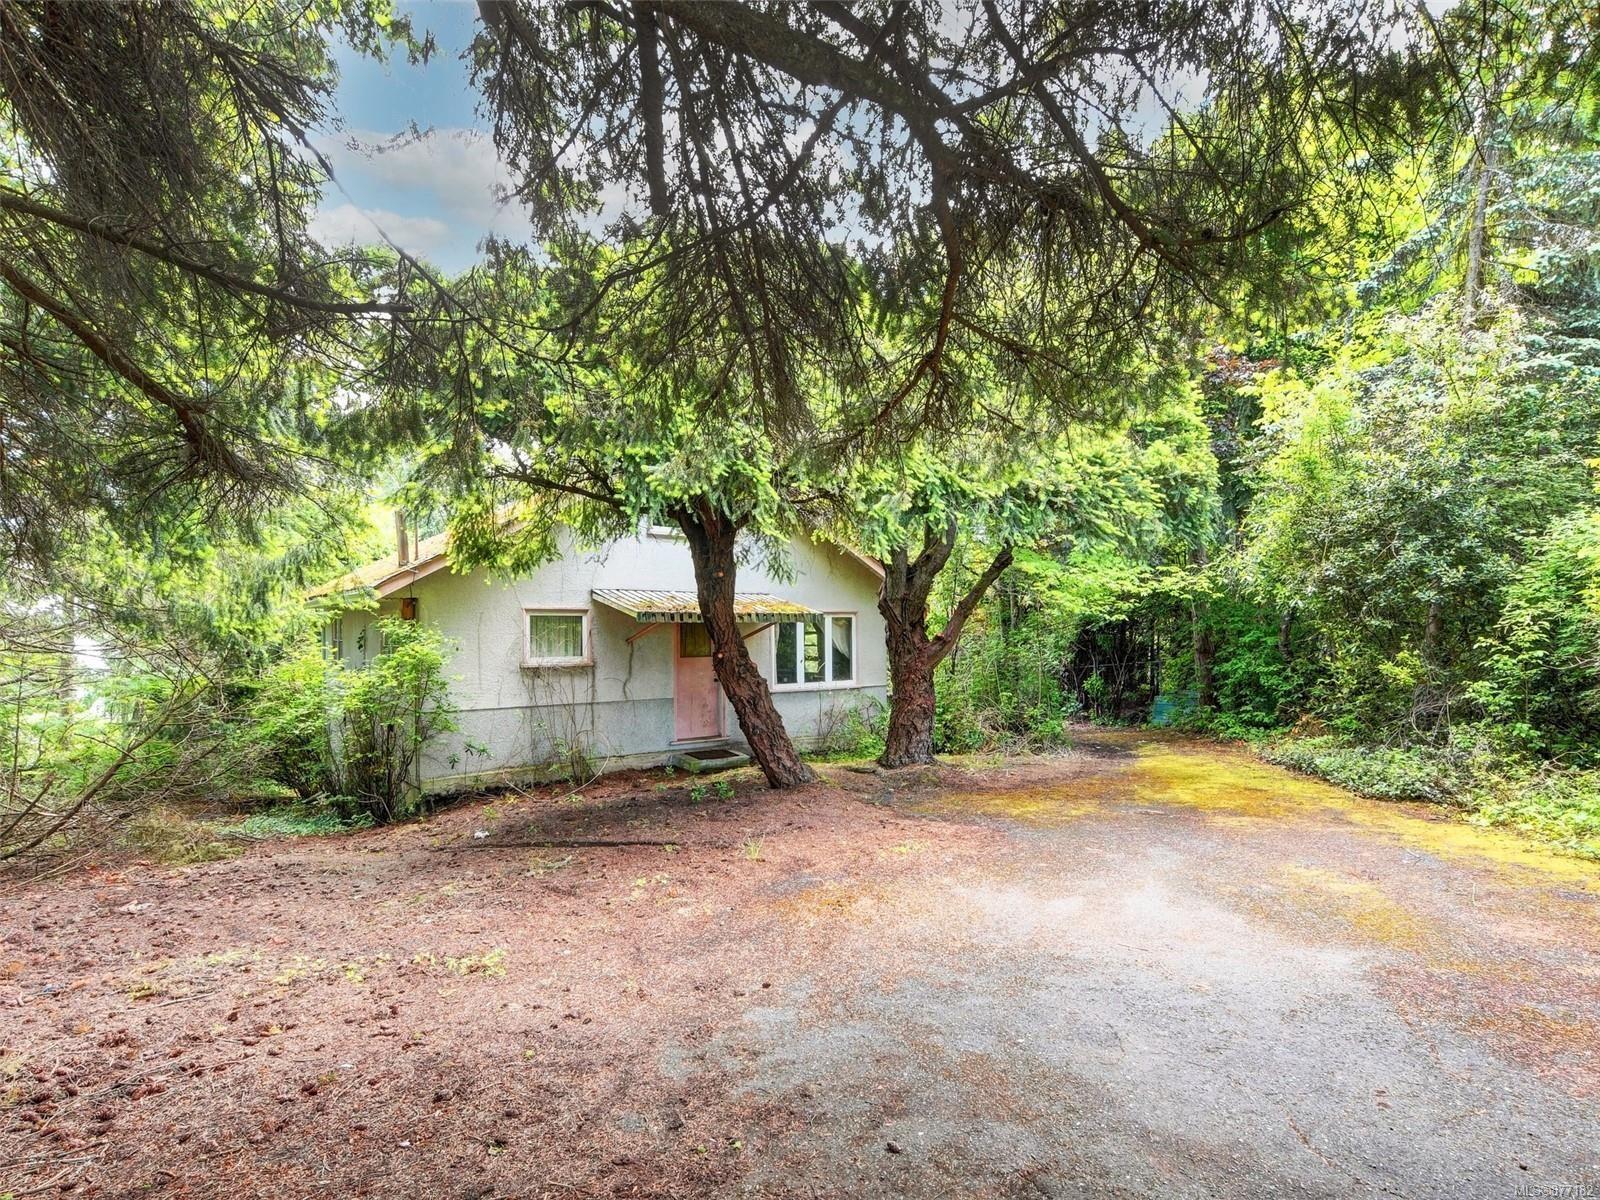 Main Photo: 8369 Lochside Dr in Central Saanich: CS Saanichton House for sale : MLS®# 877182